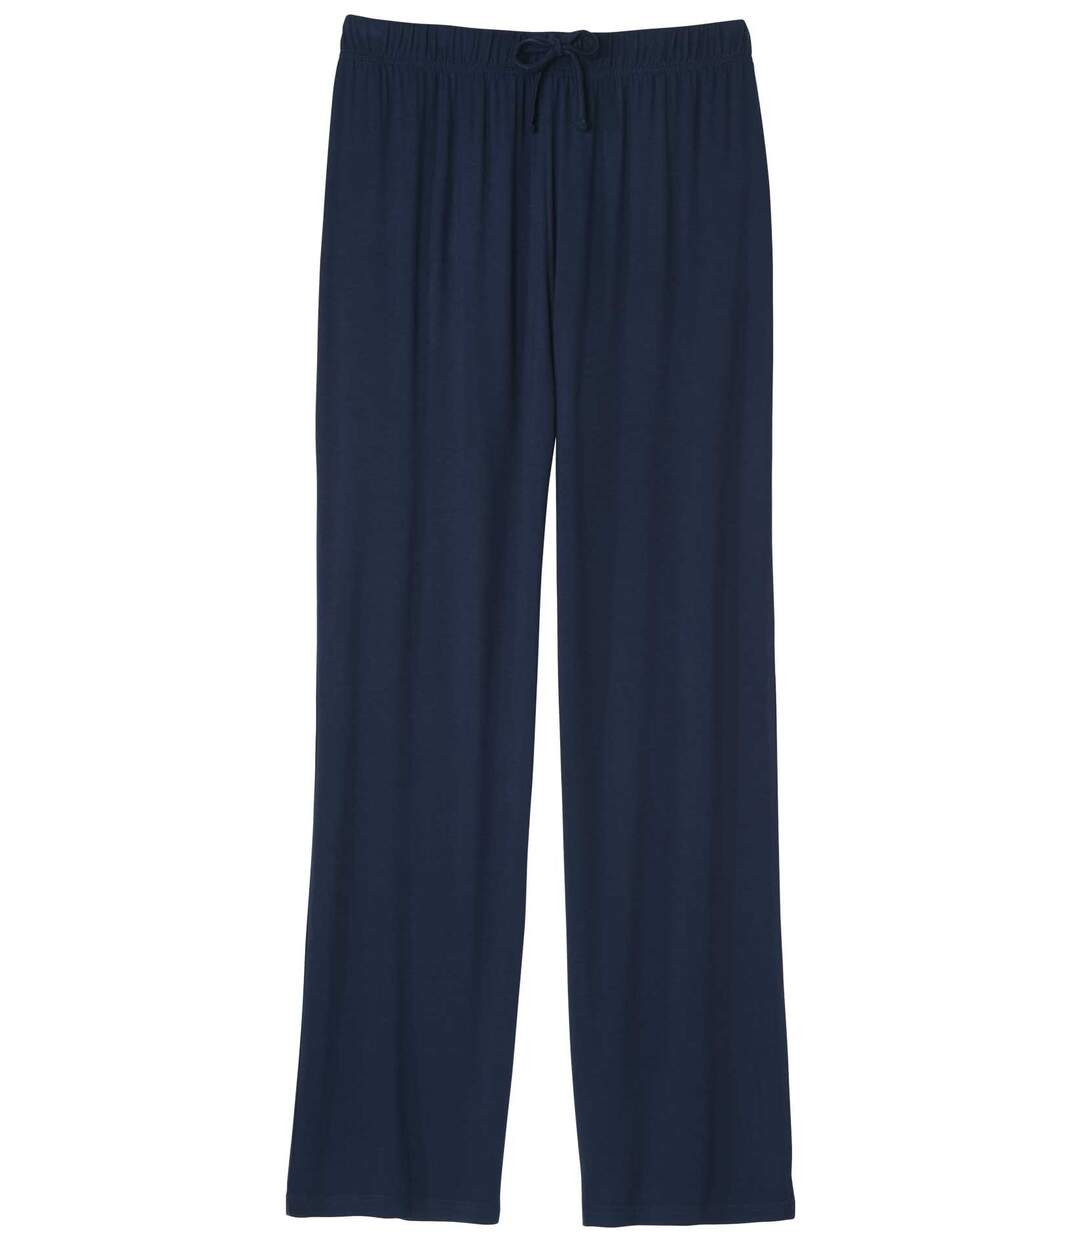 Women's Loose Fit Pants - Navy Atlas For Men